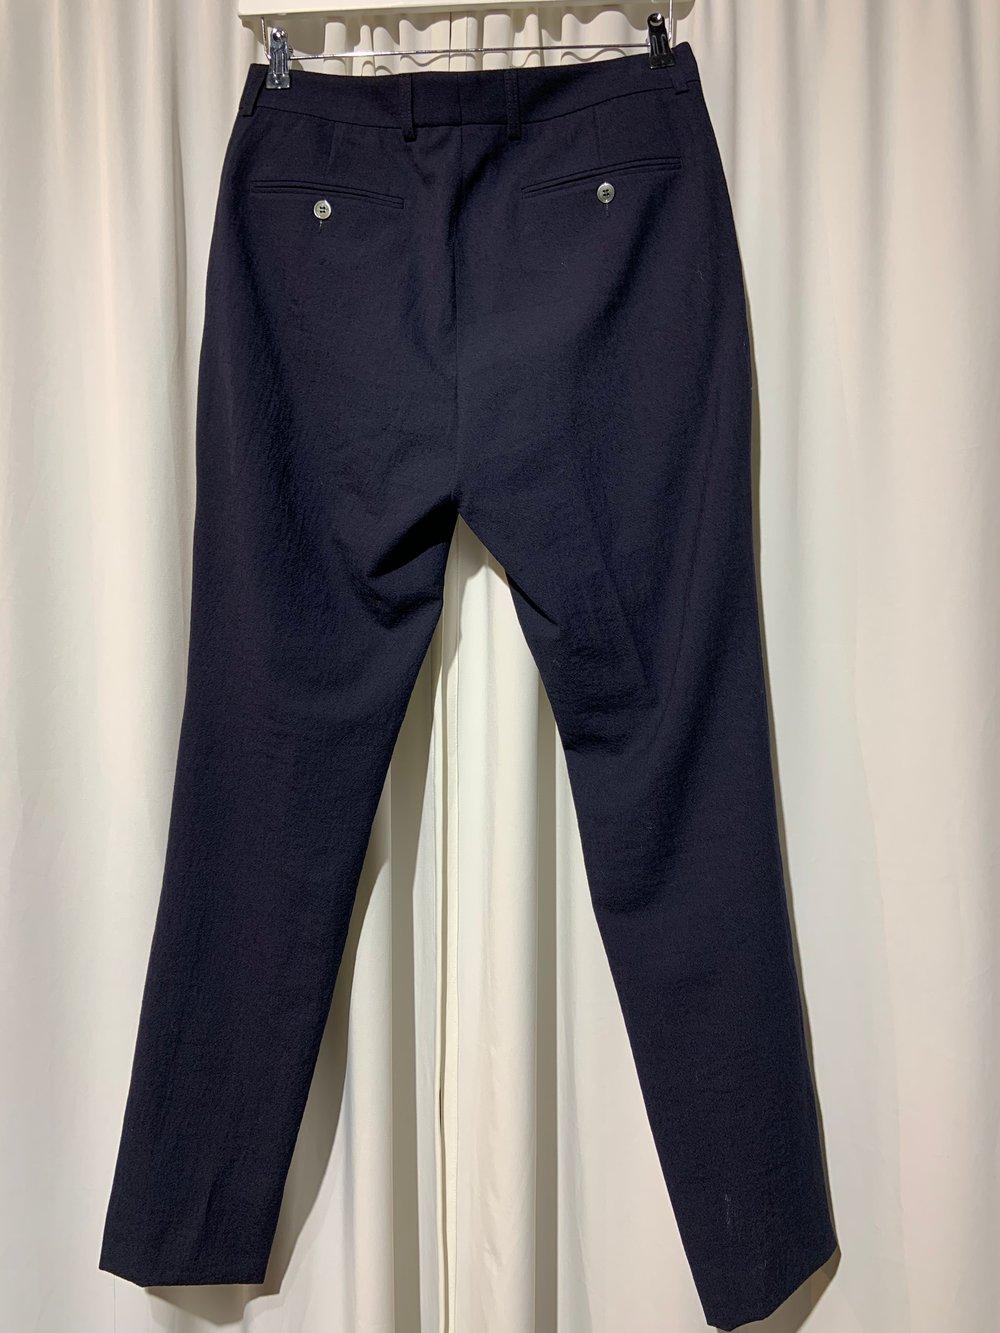 DELIKATESSEN linen trousers